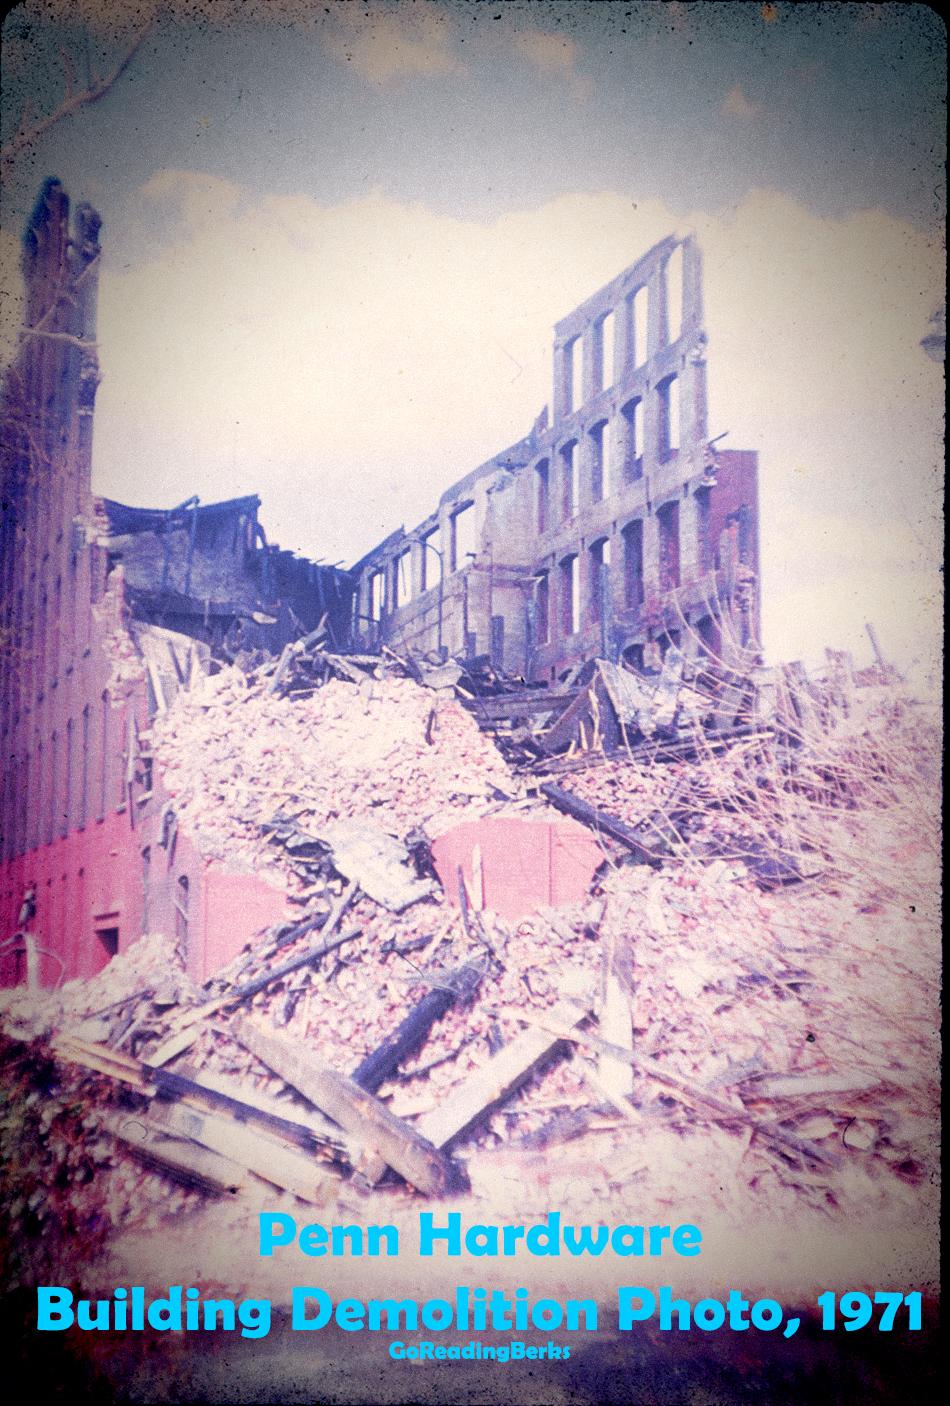 Penn Hardware Demolition